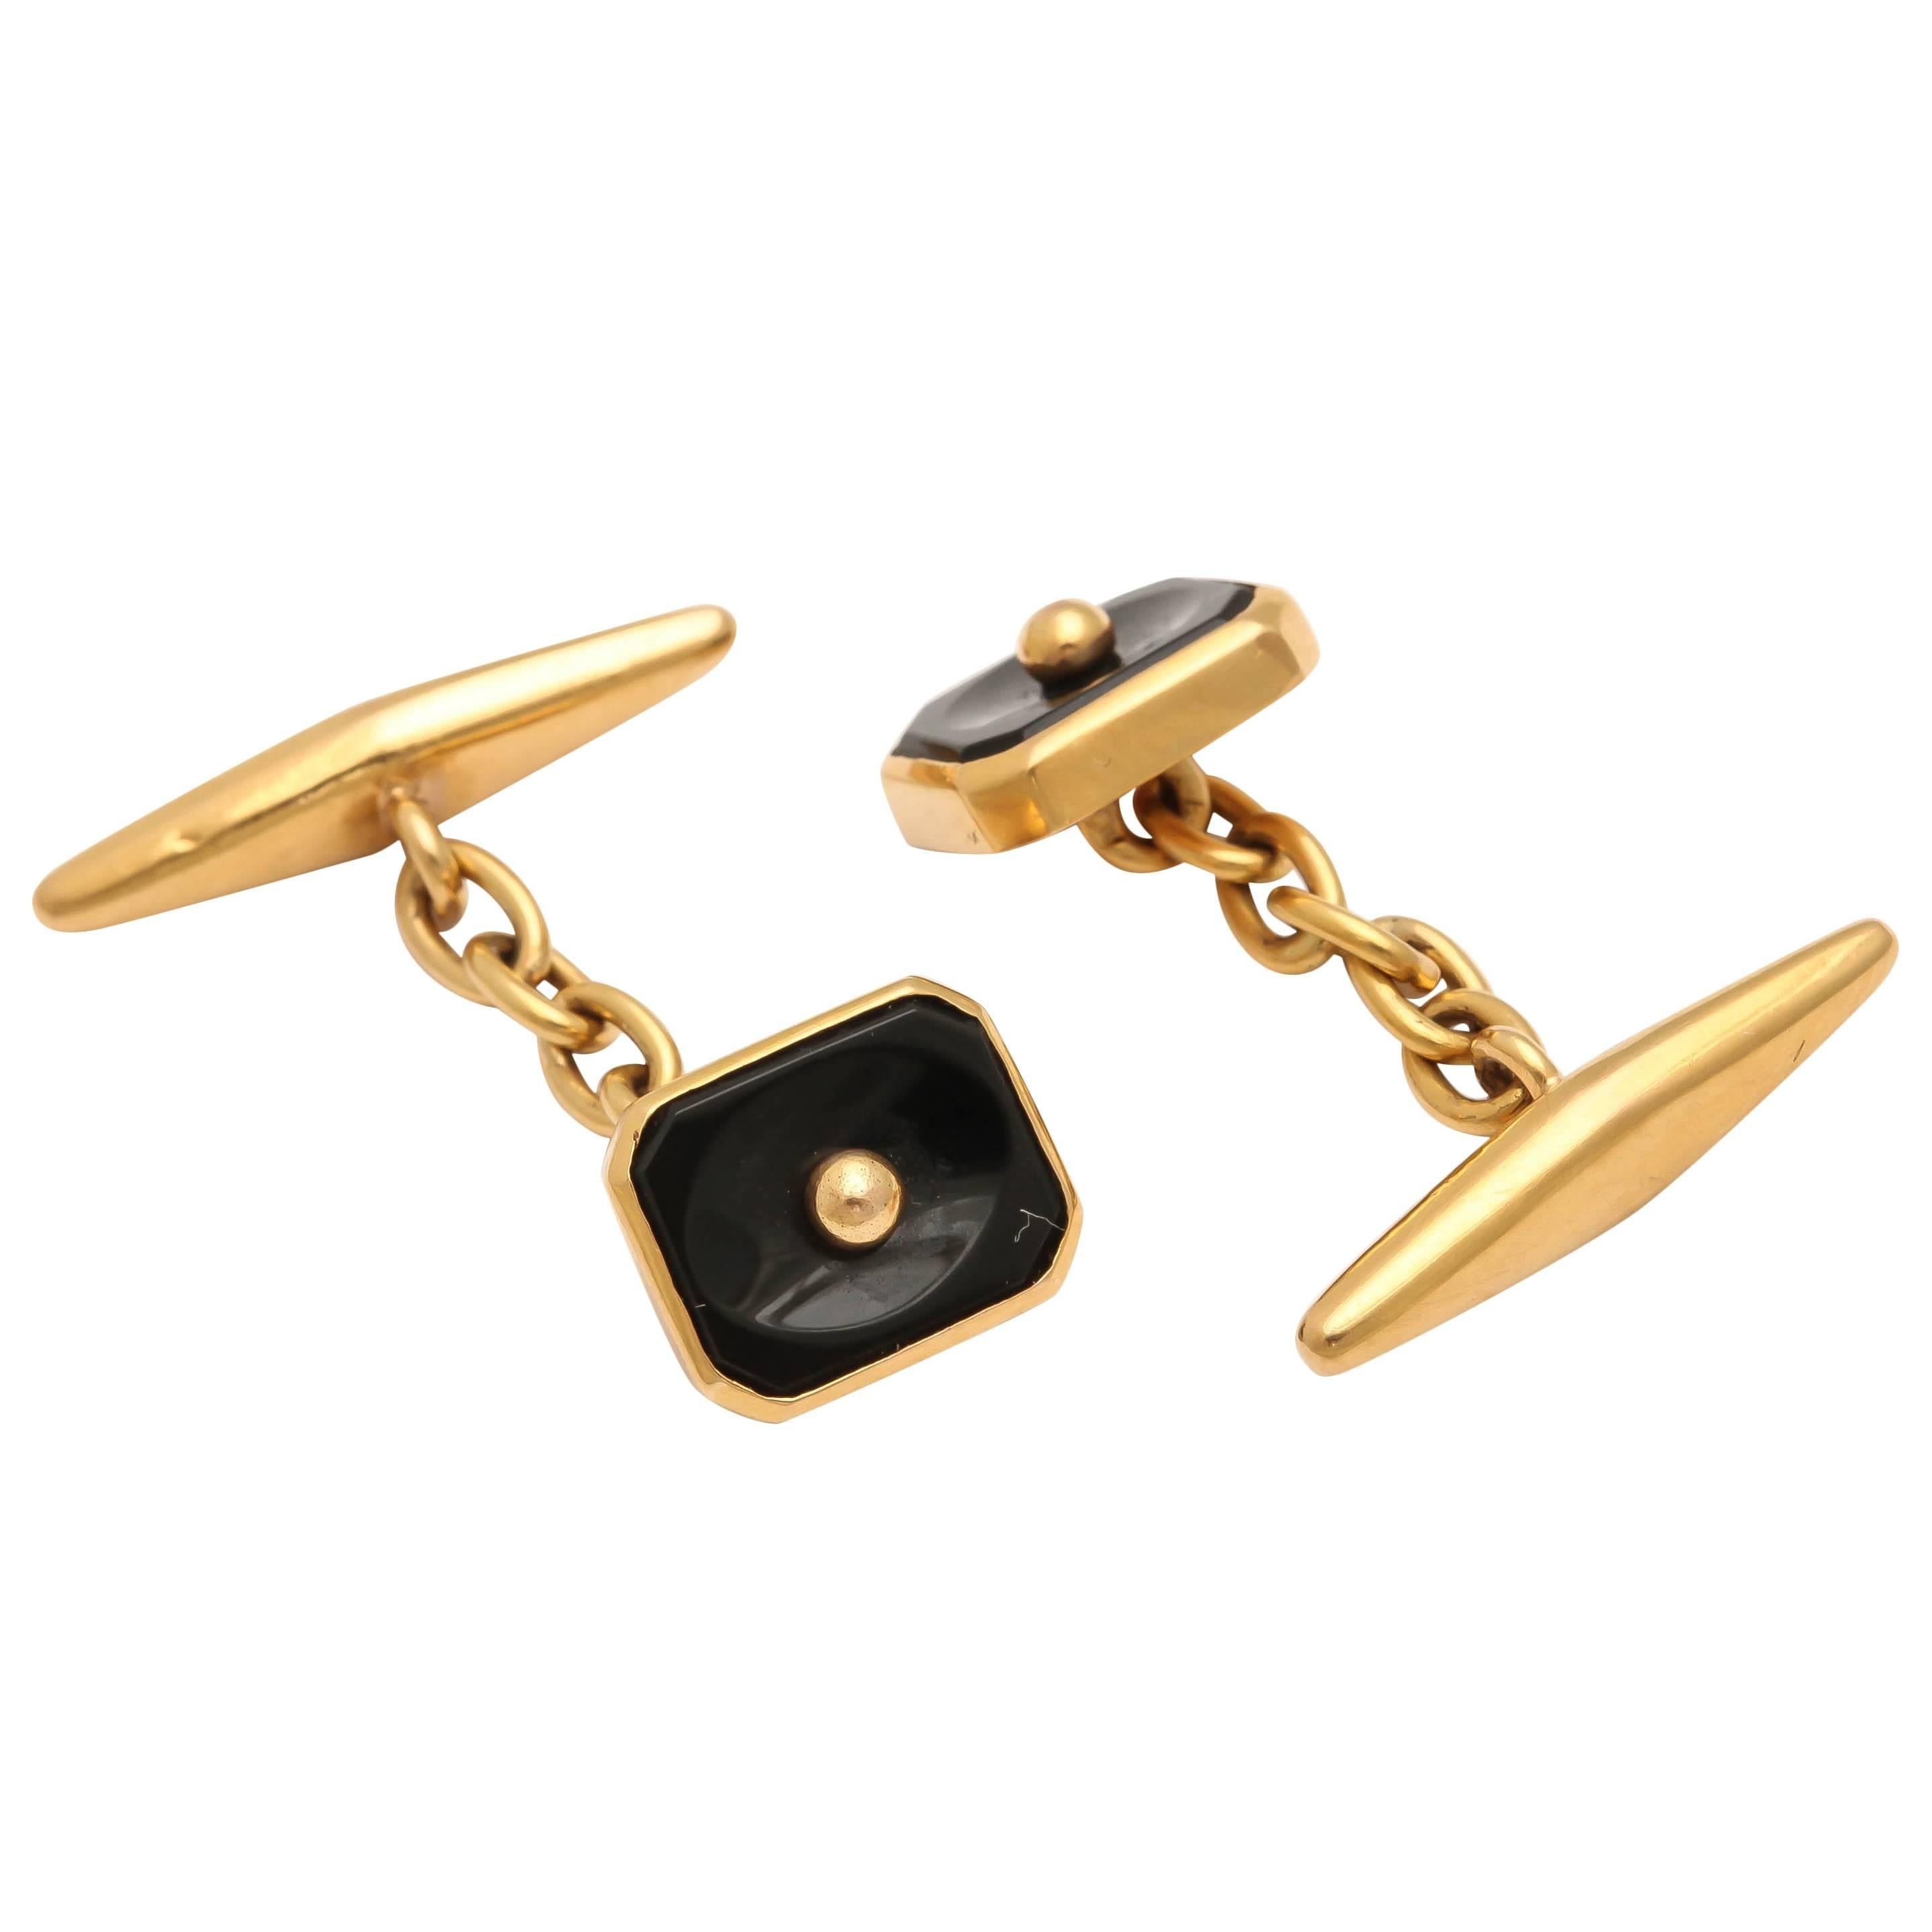 1950s Portuguese Black Onyx 18k Gold Cufflinks